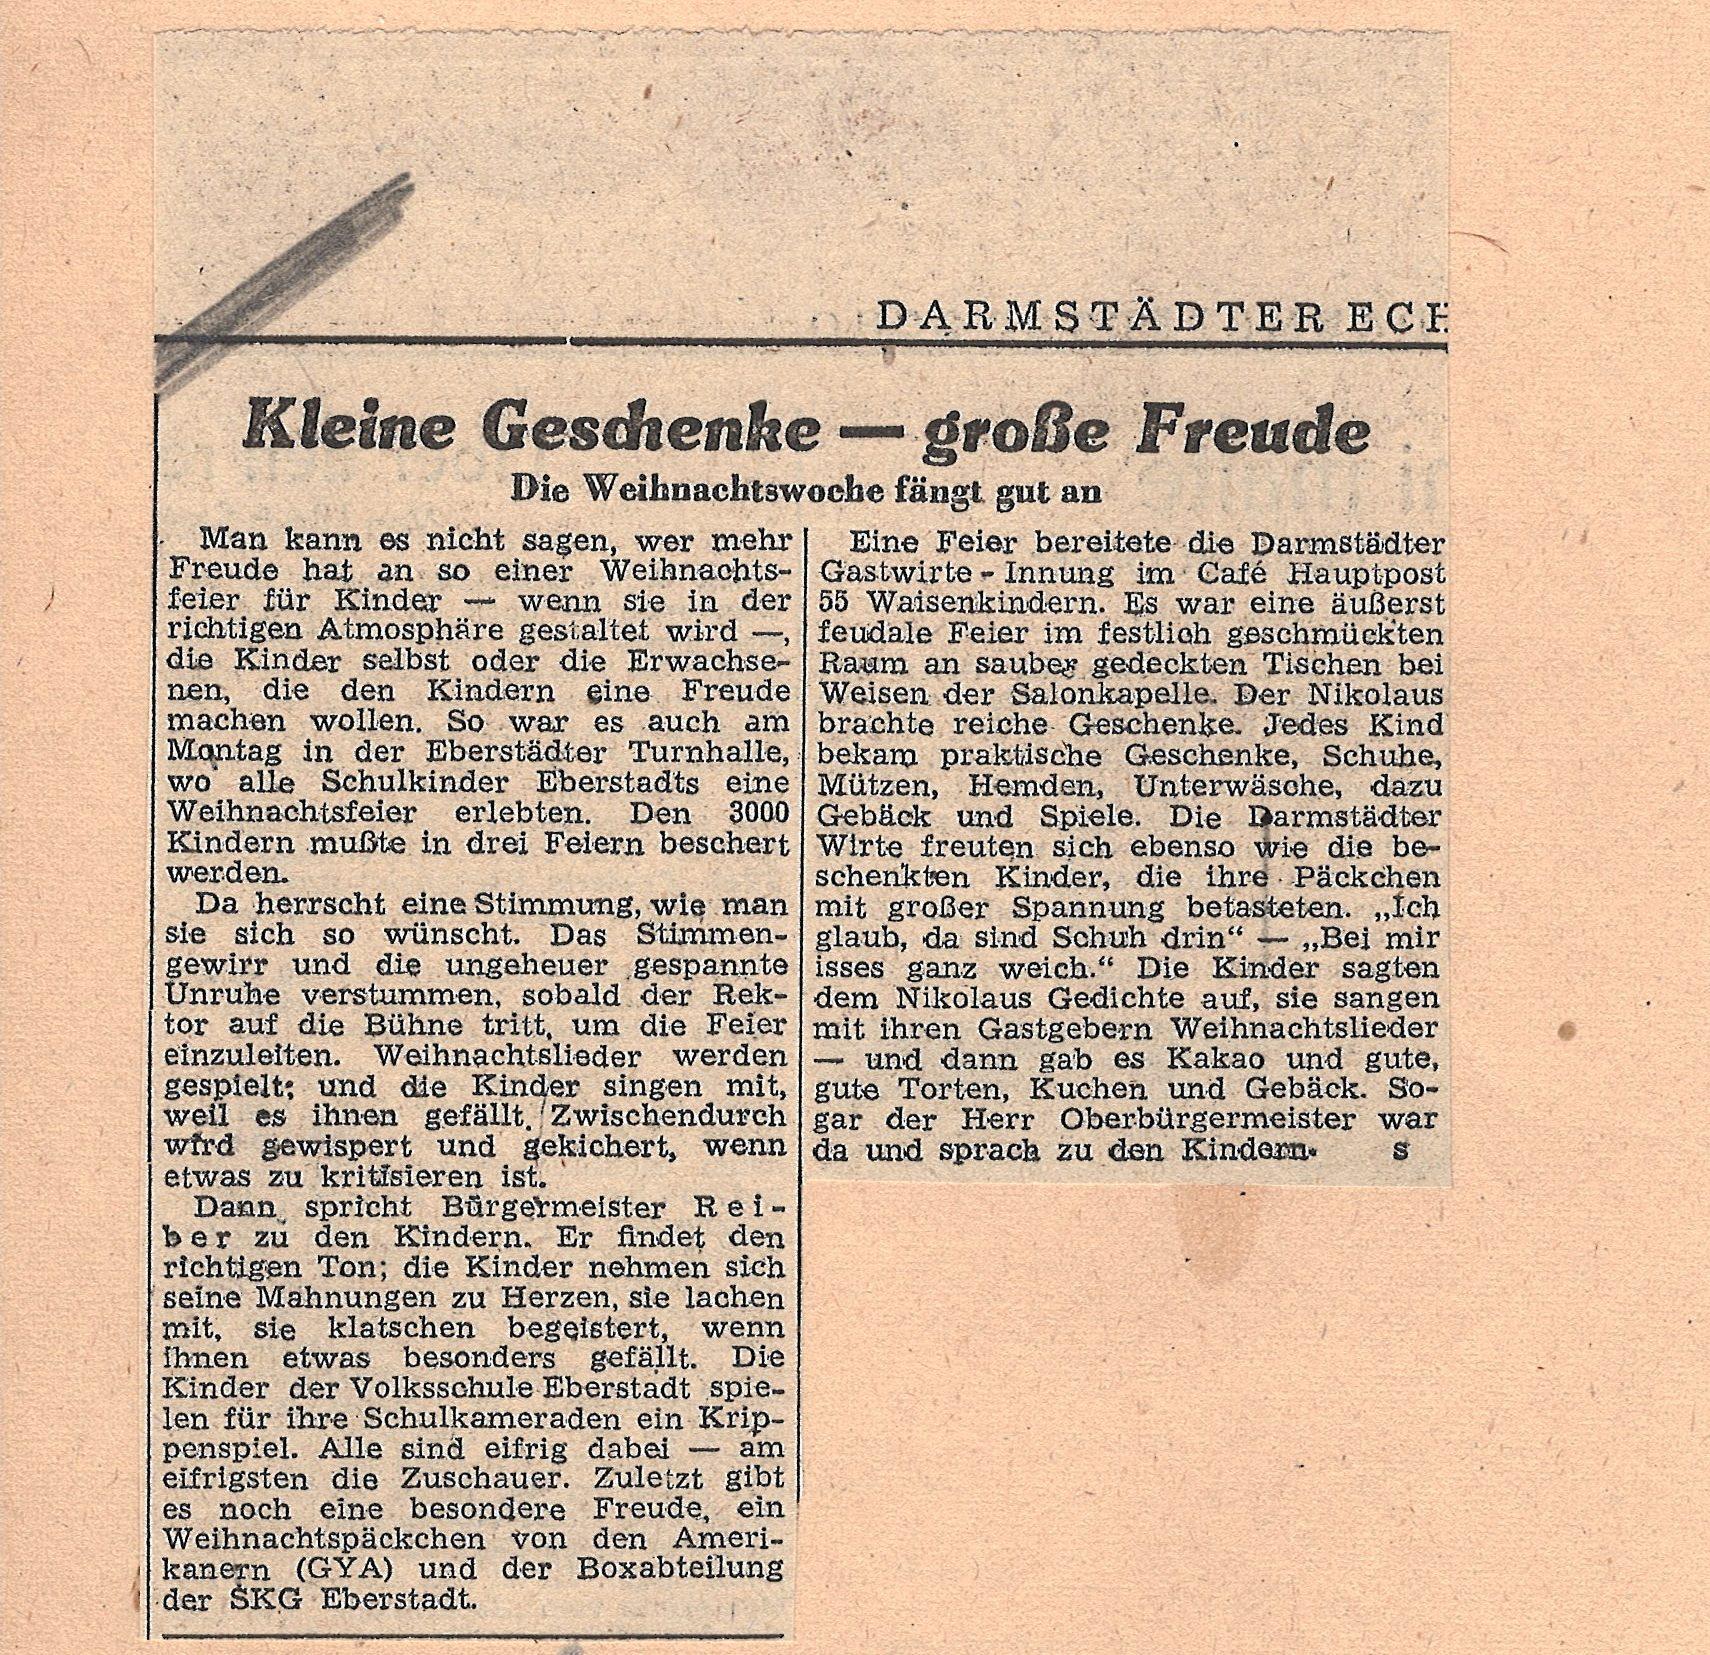 Ausschnitt aus dem Darmstädter Echo vom 21. Dezember 1948, StadtA DA Best. 201